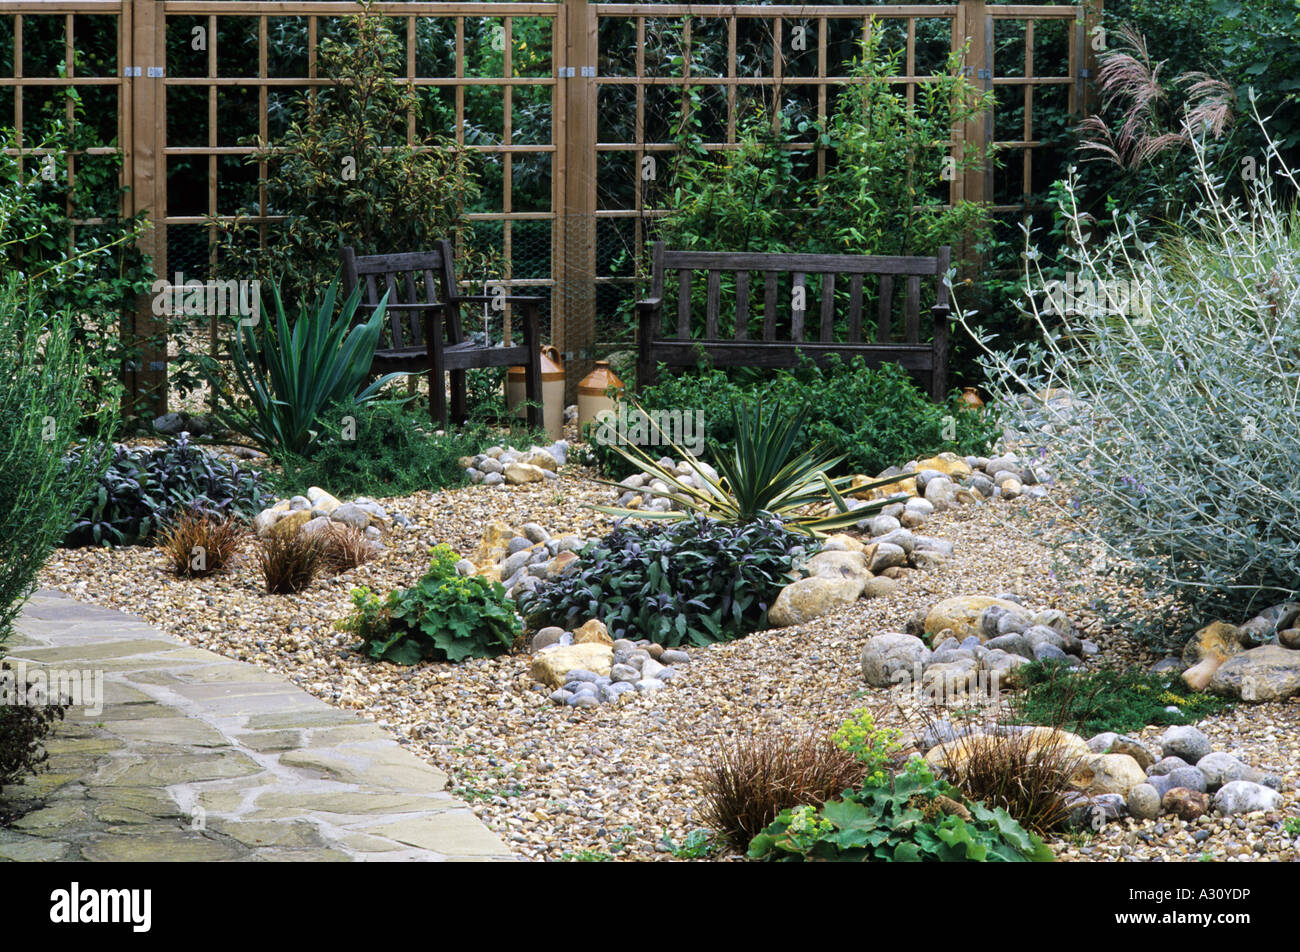 Gravel garden path trellis bench drought tolerant plants for Garden rocks and pebbles